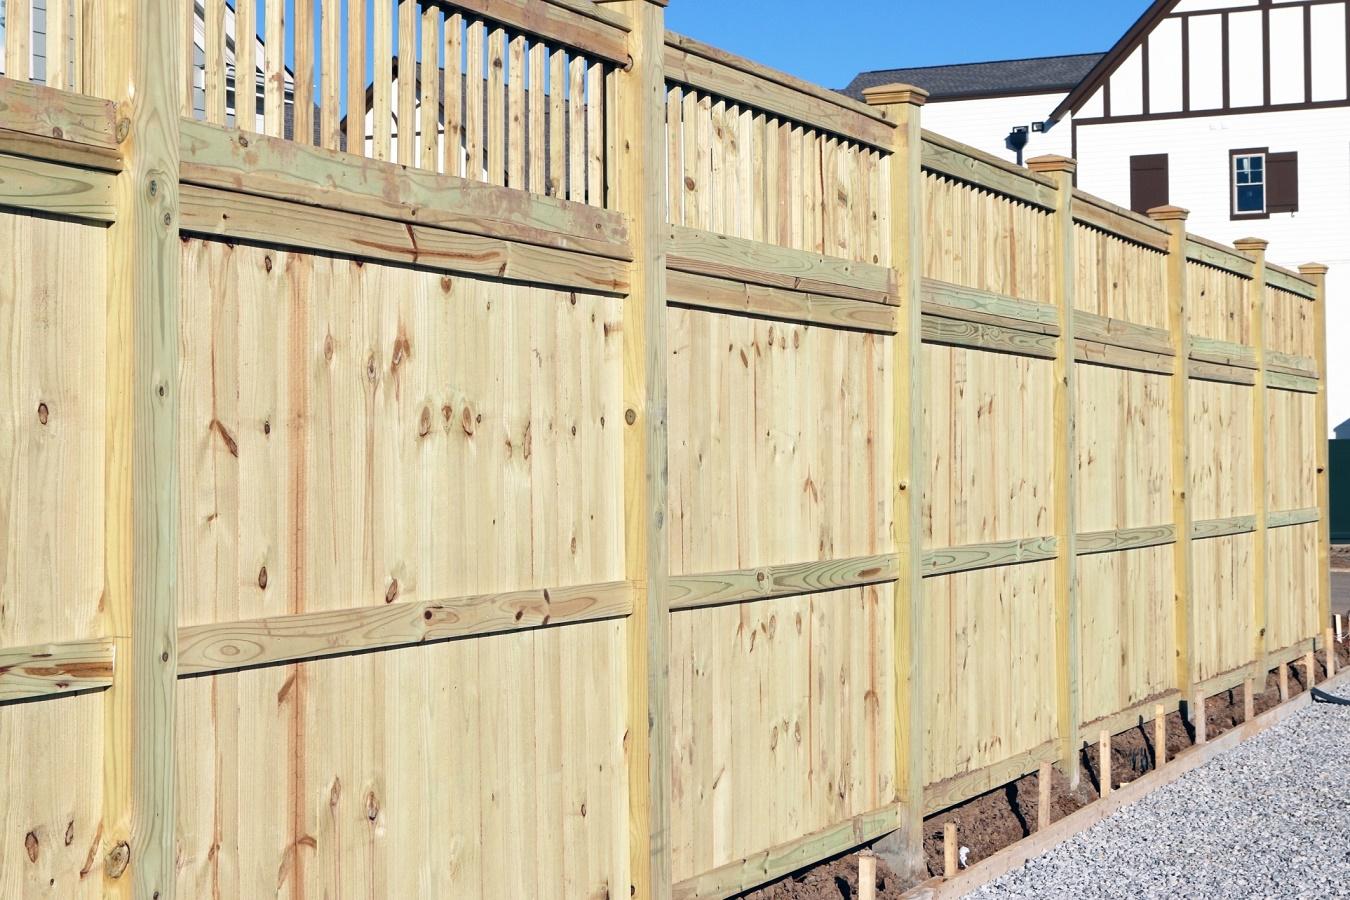 A-1 Wholesale Building Supplies & Fence image 0